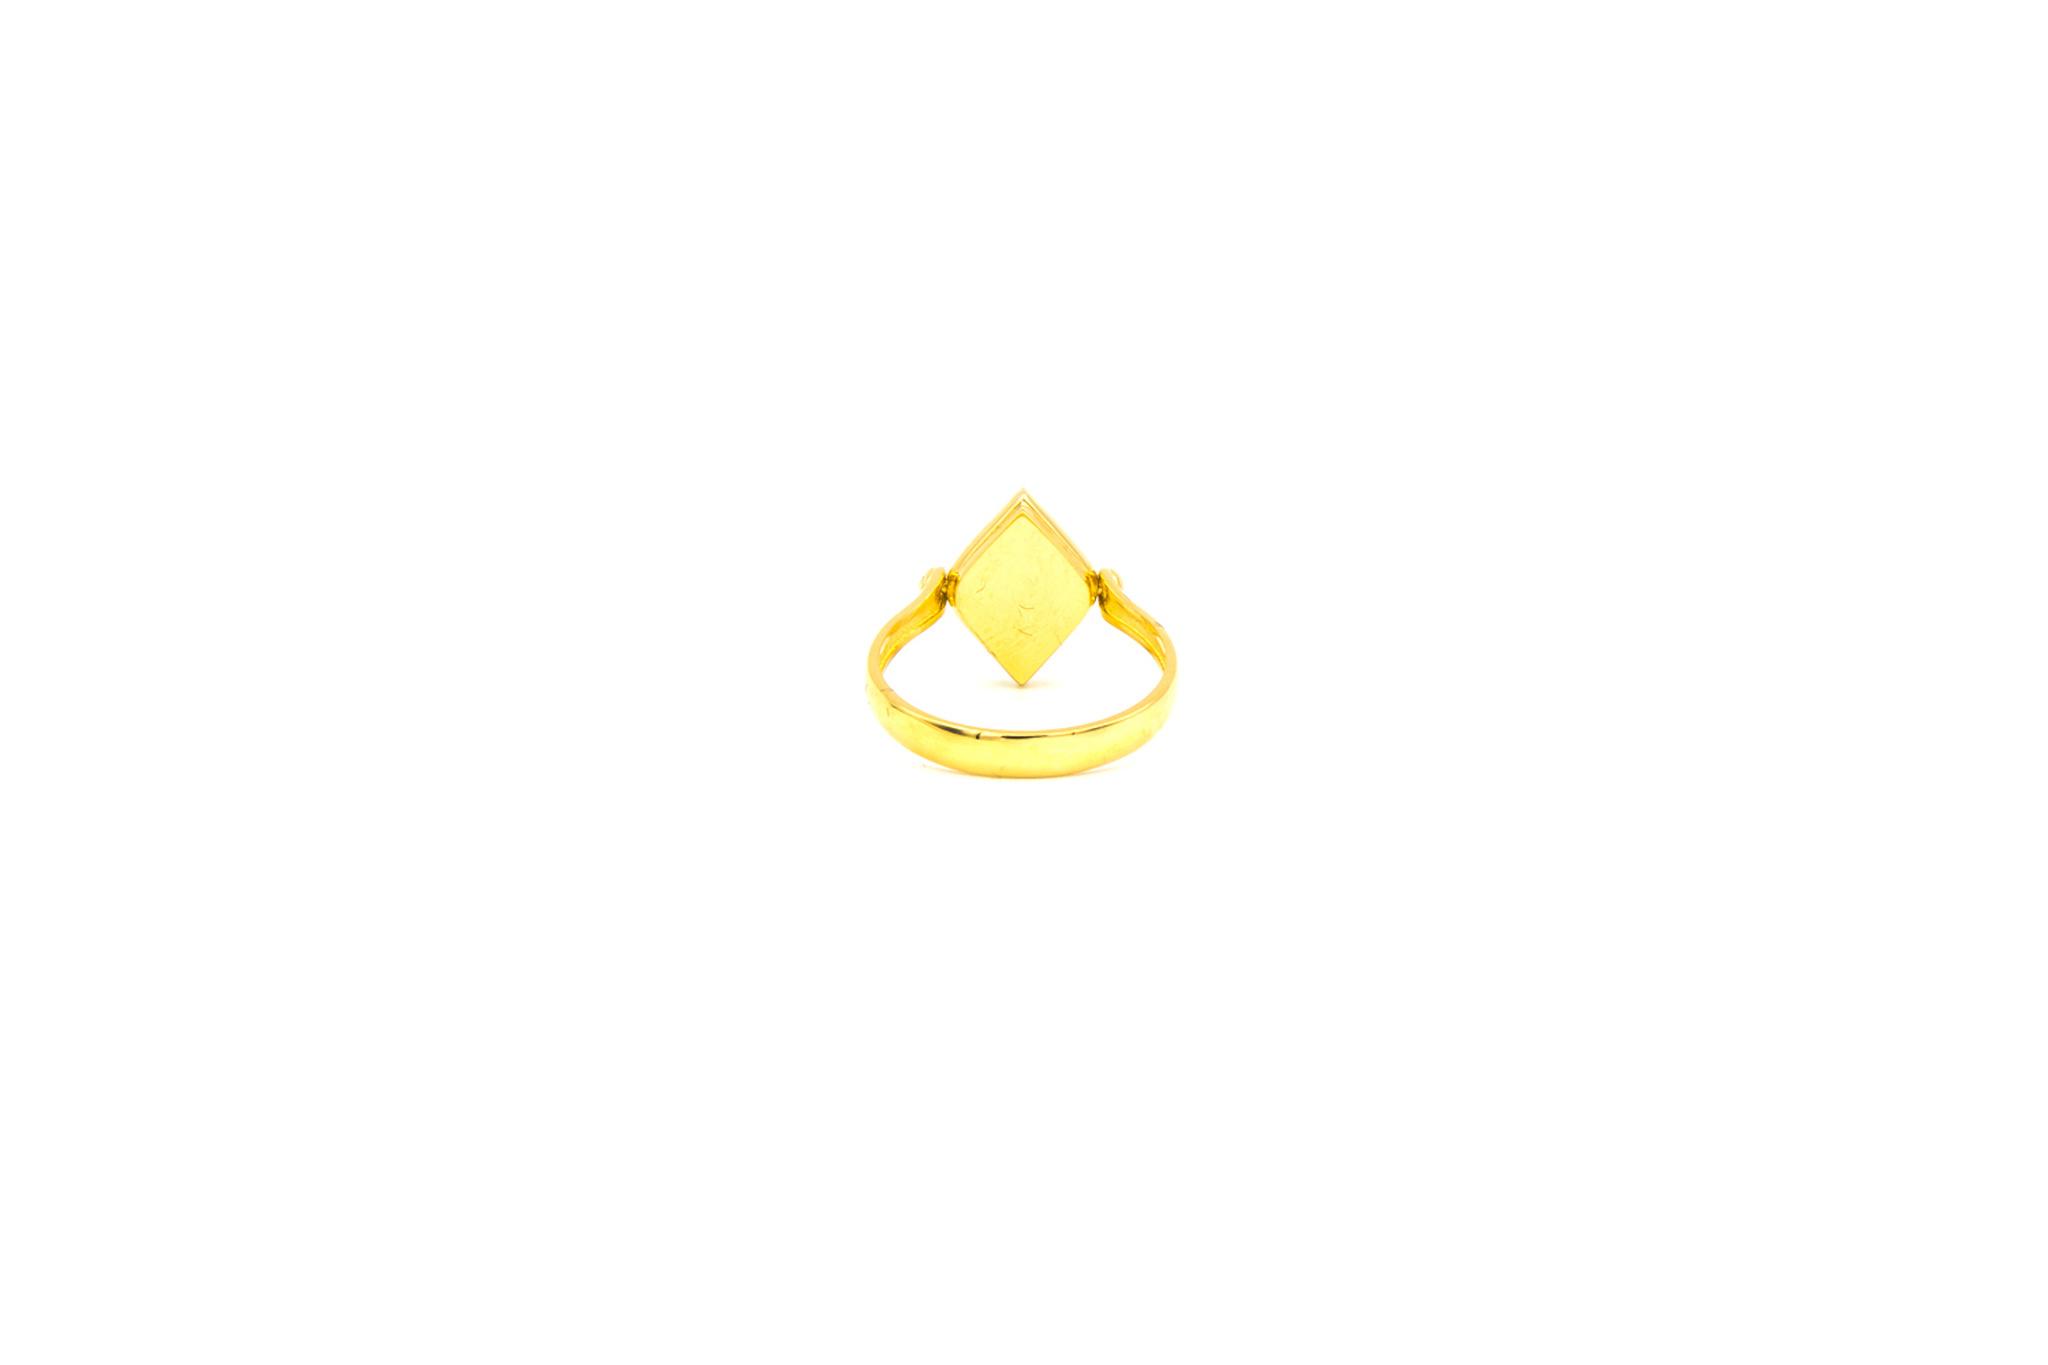 Ring beweegbare kop ruit-4